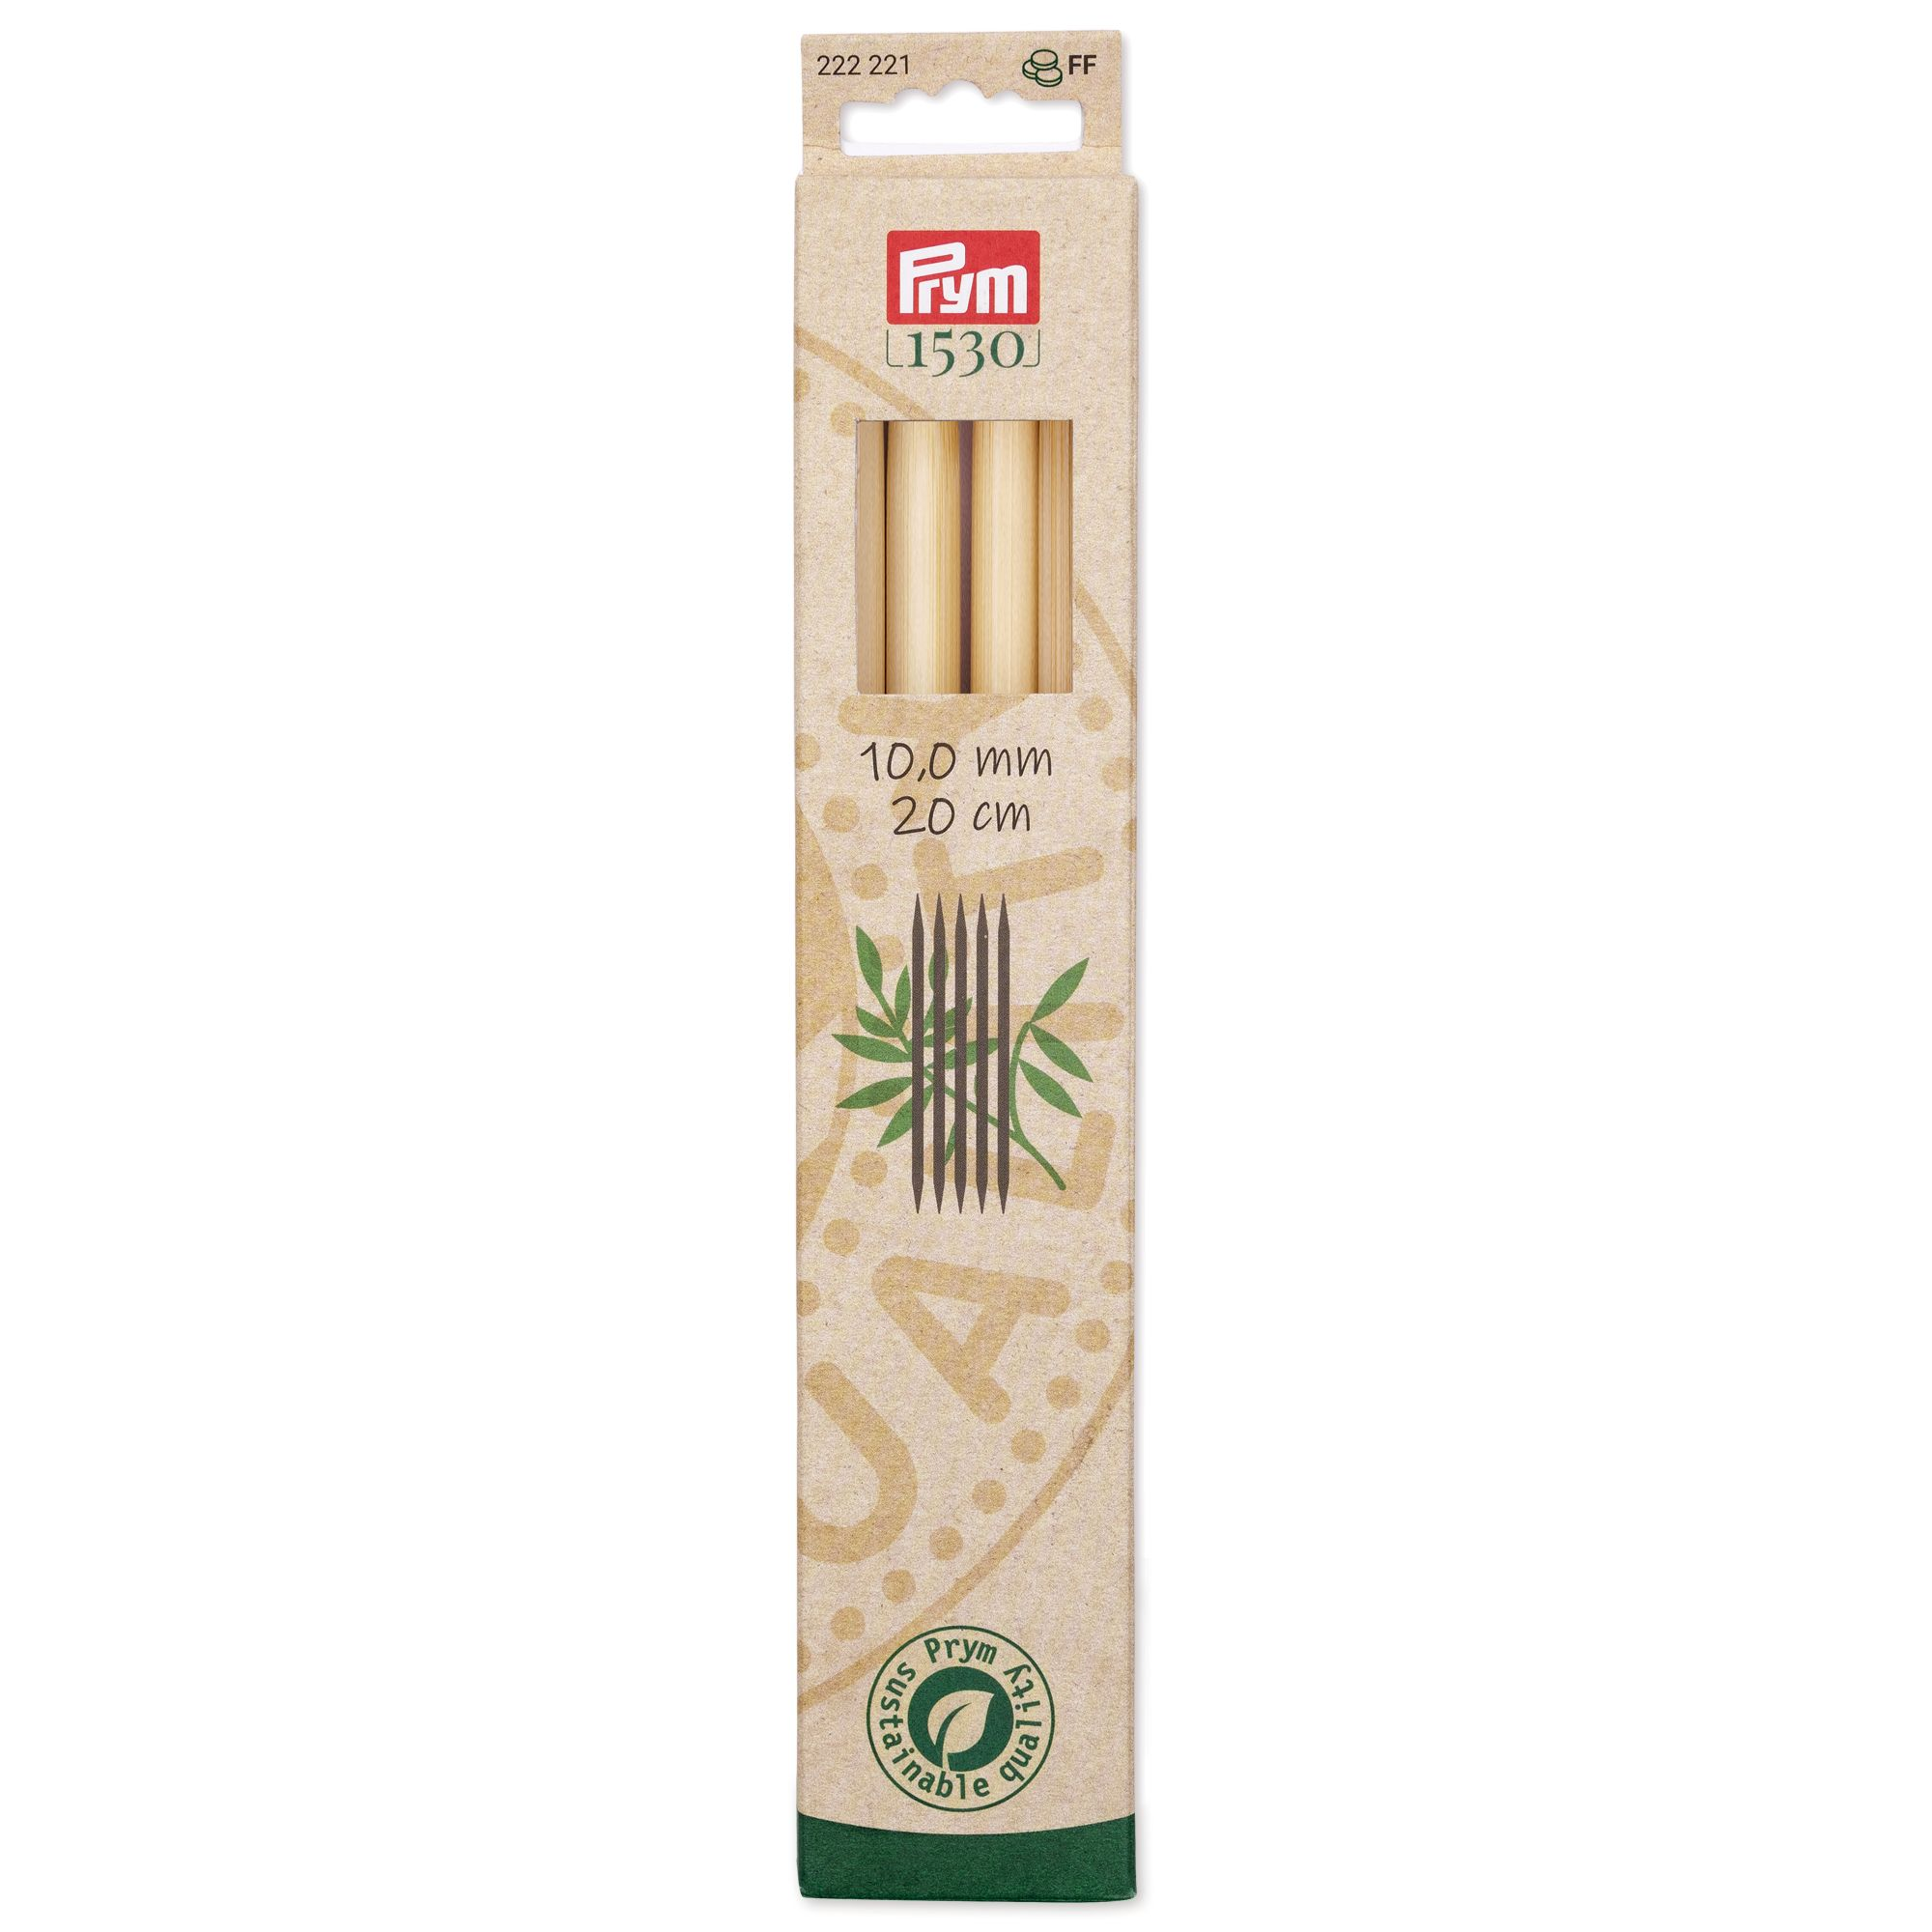 Prym 222221 Strumpfstricknadeln Bambus